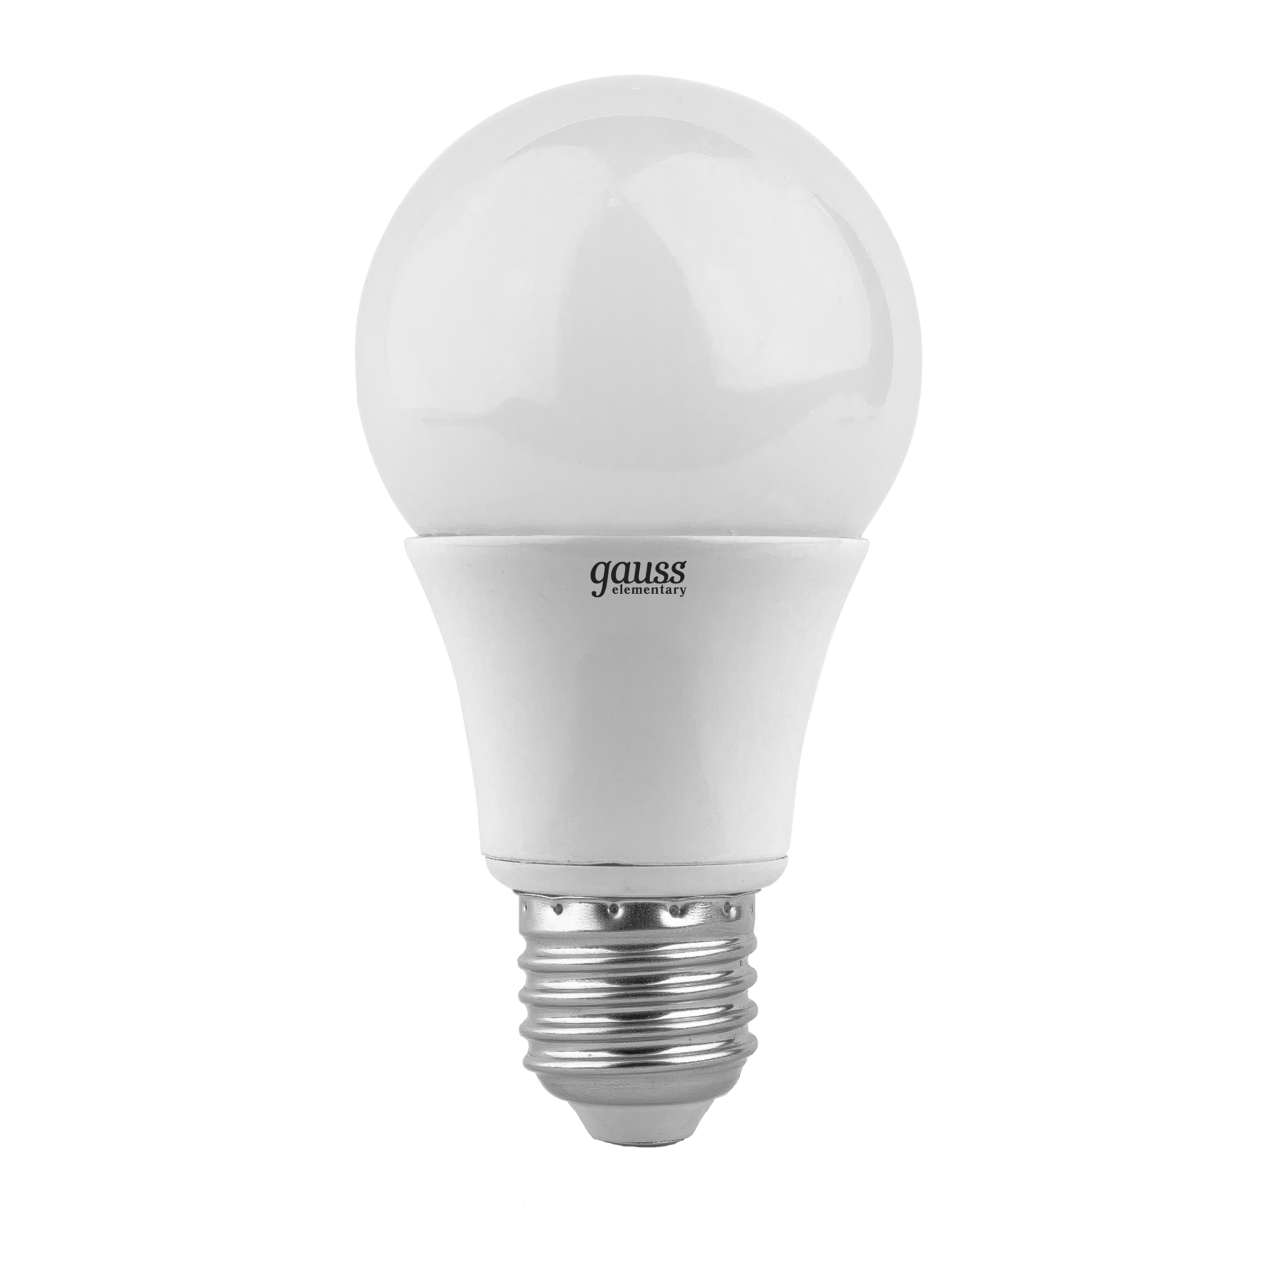 Лампа светодиодная E27 10W 3000K матовая 23210 лампа светодиодная e27 10w 2700k груша матовая 23210